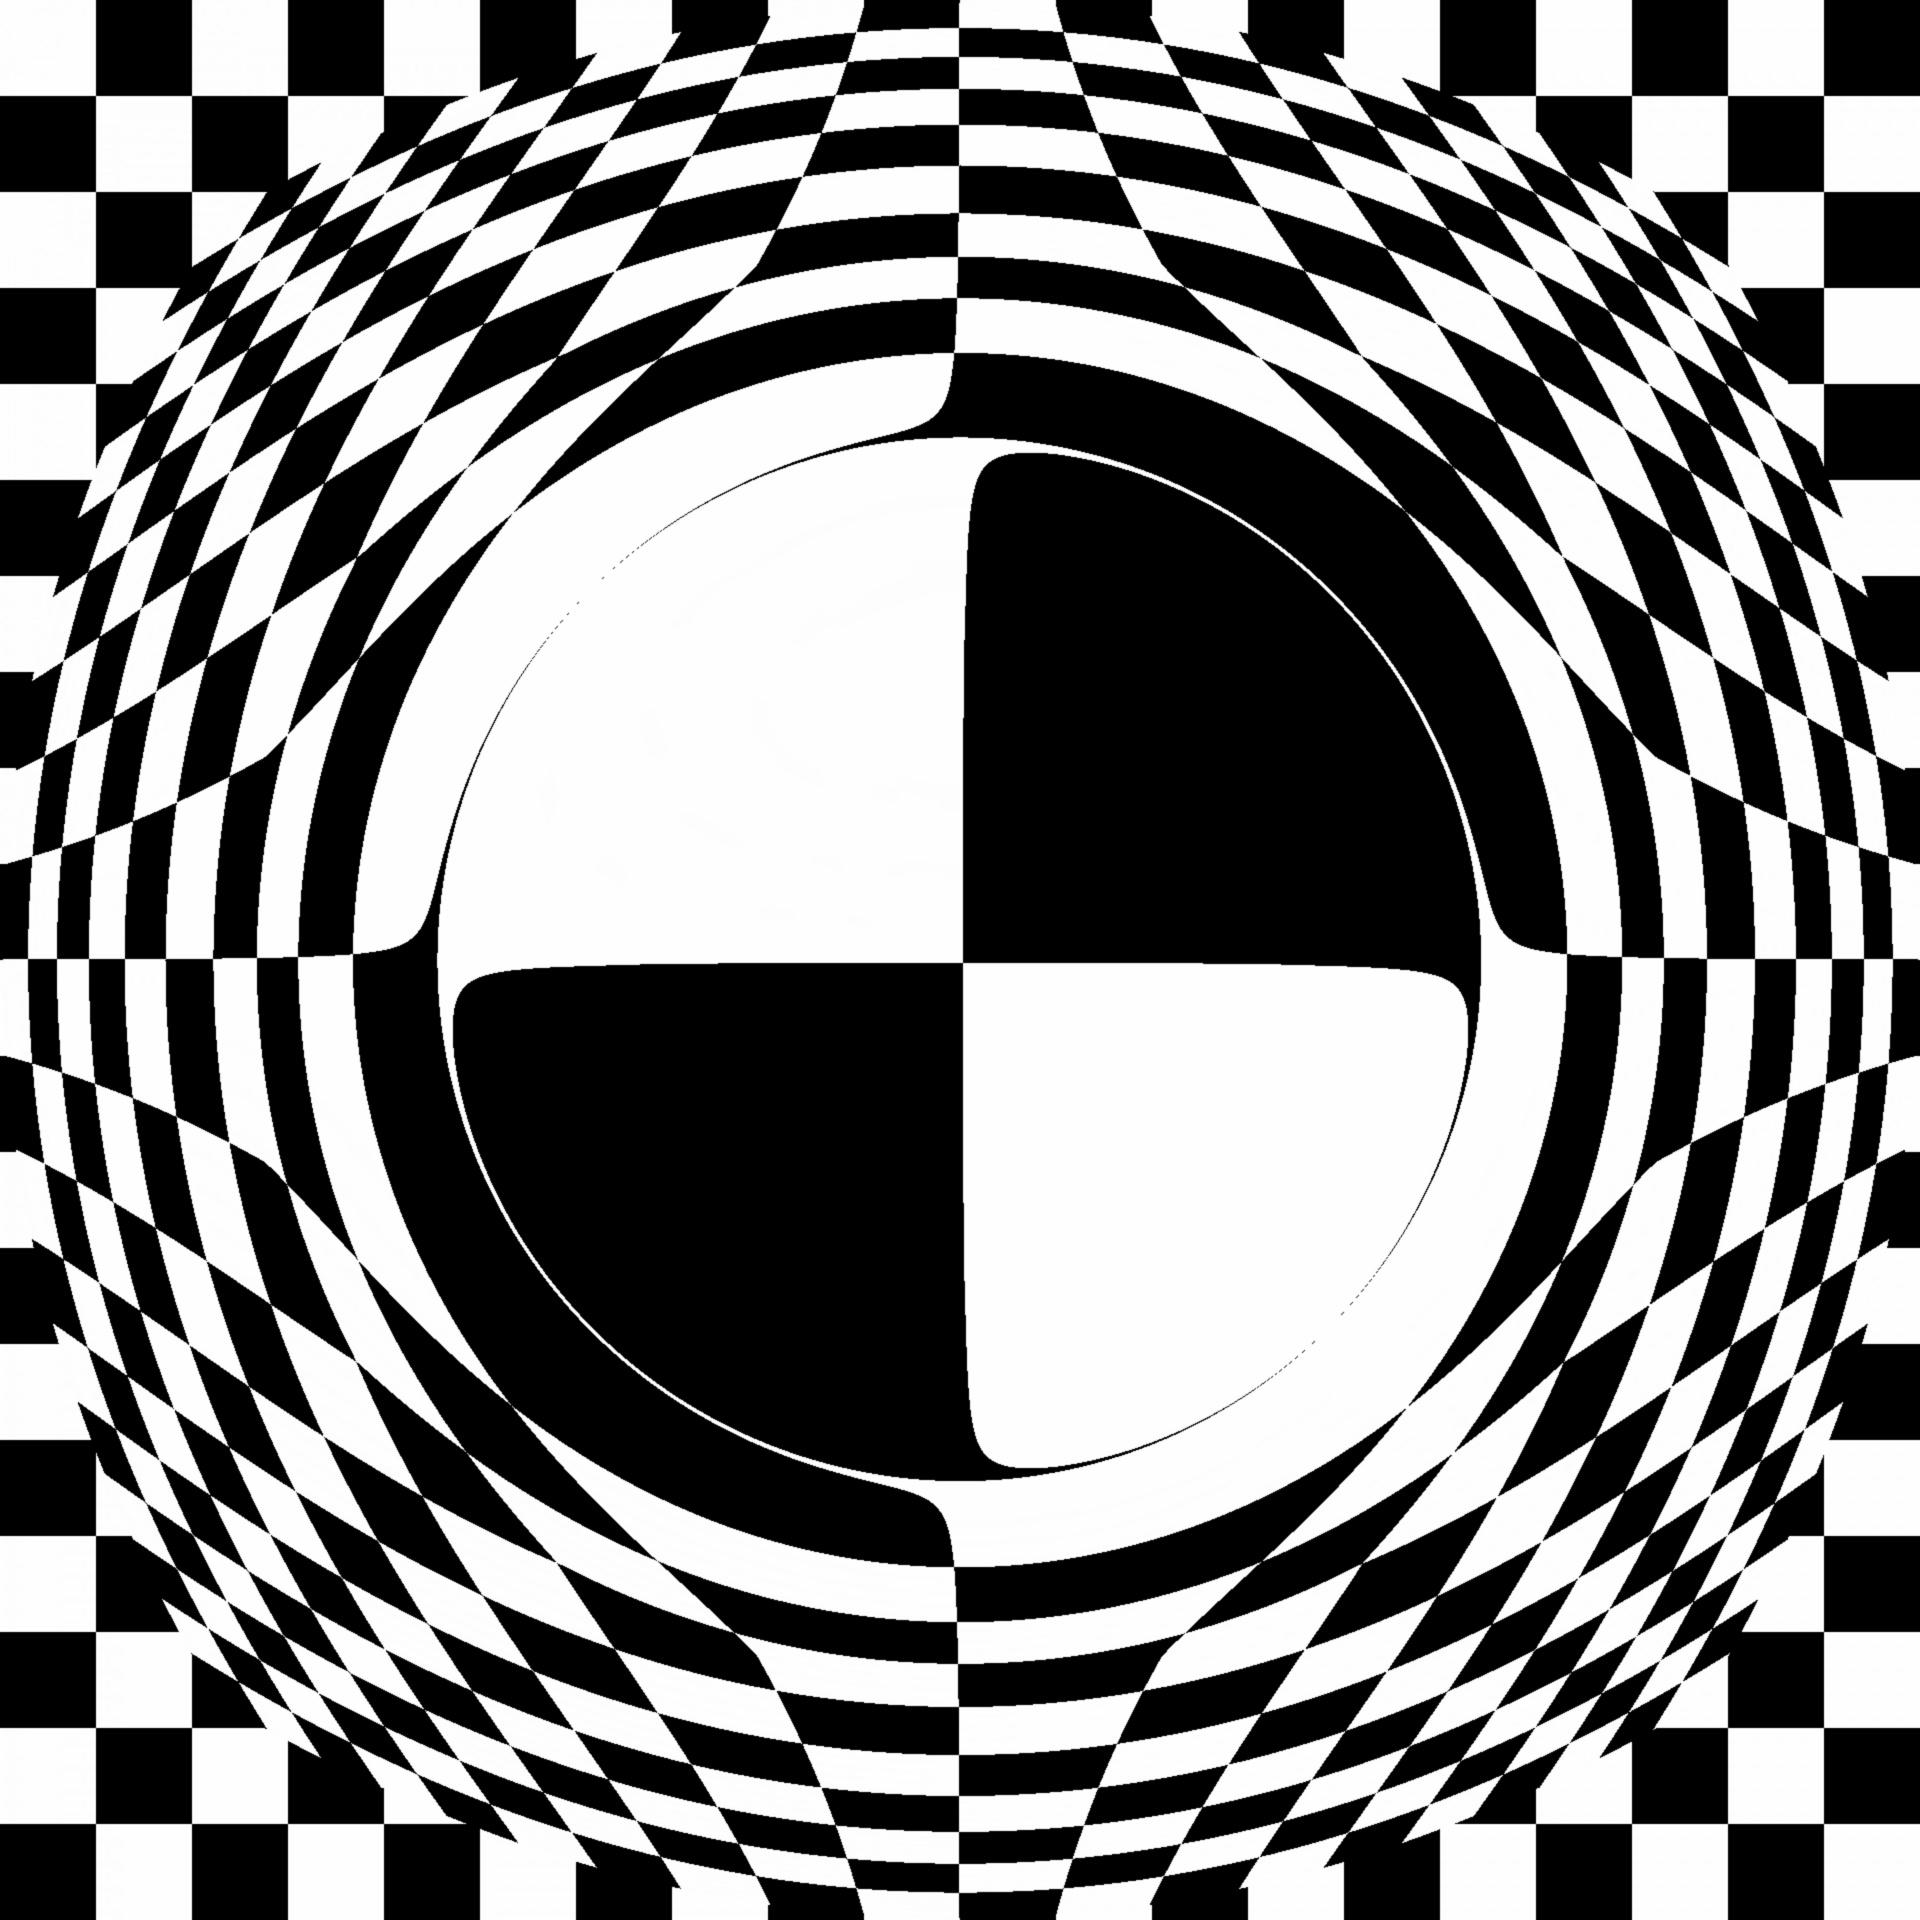 1920x1920 Circle Checkerboard 2 Free Stock Photo